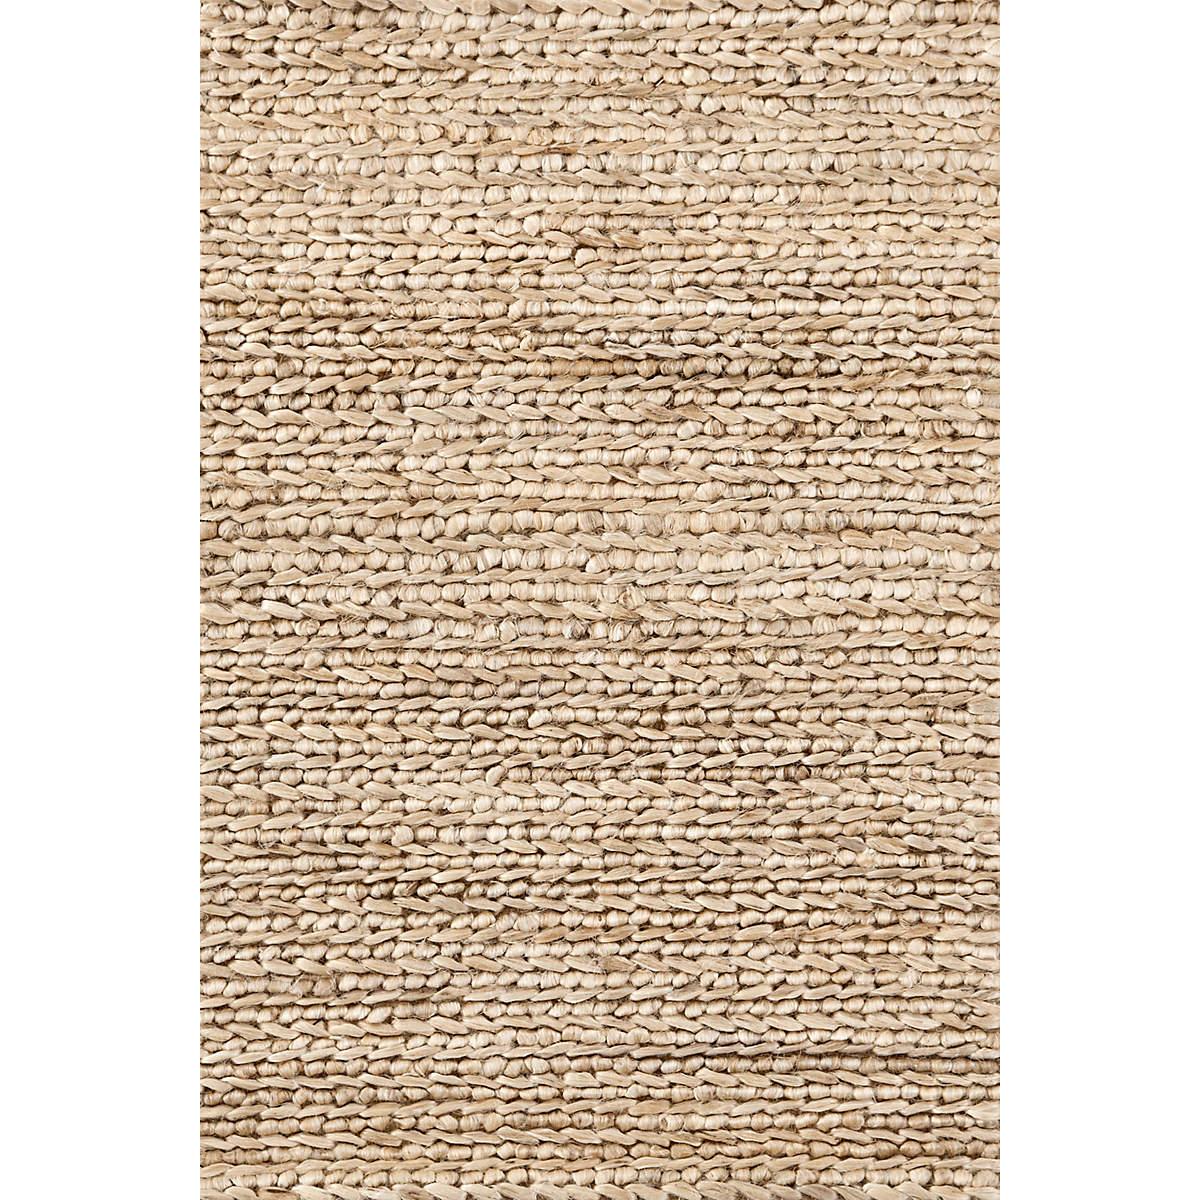 Woven rugs jute woven natural rug | dash u0026 albert GAVJGNP